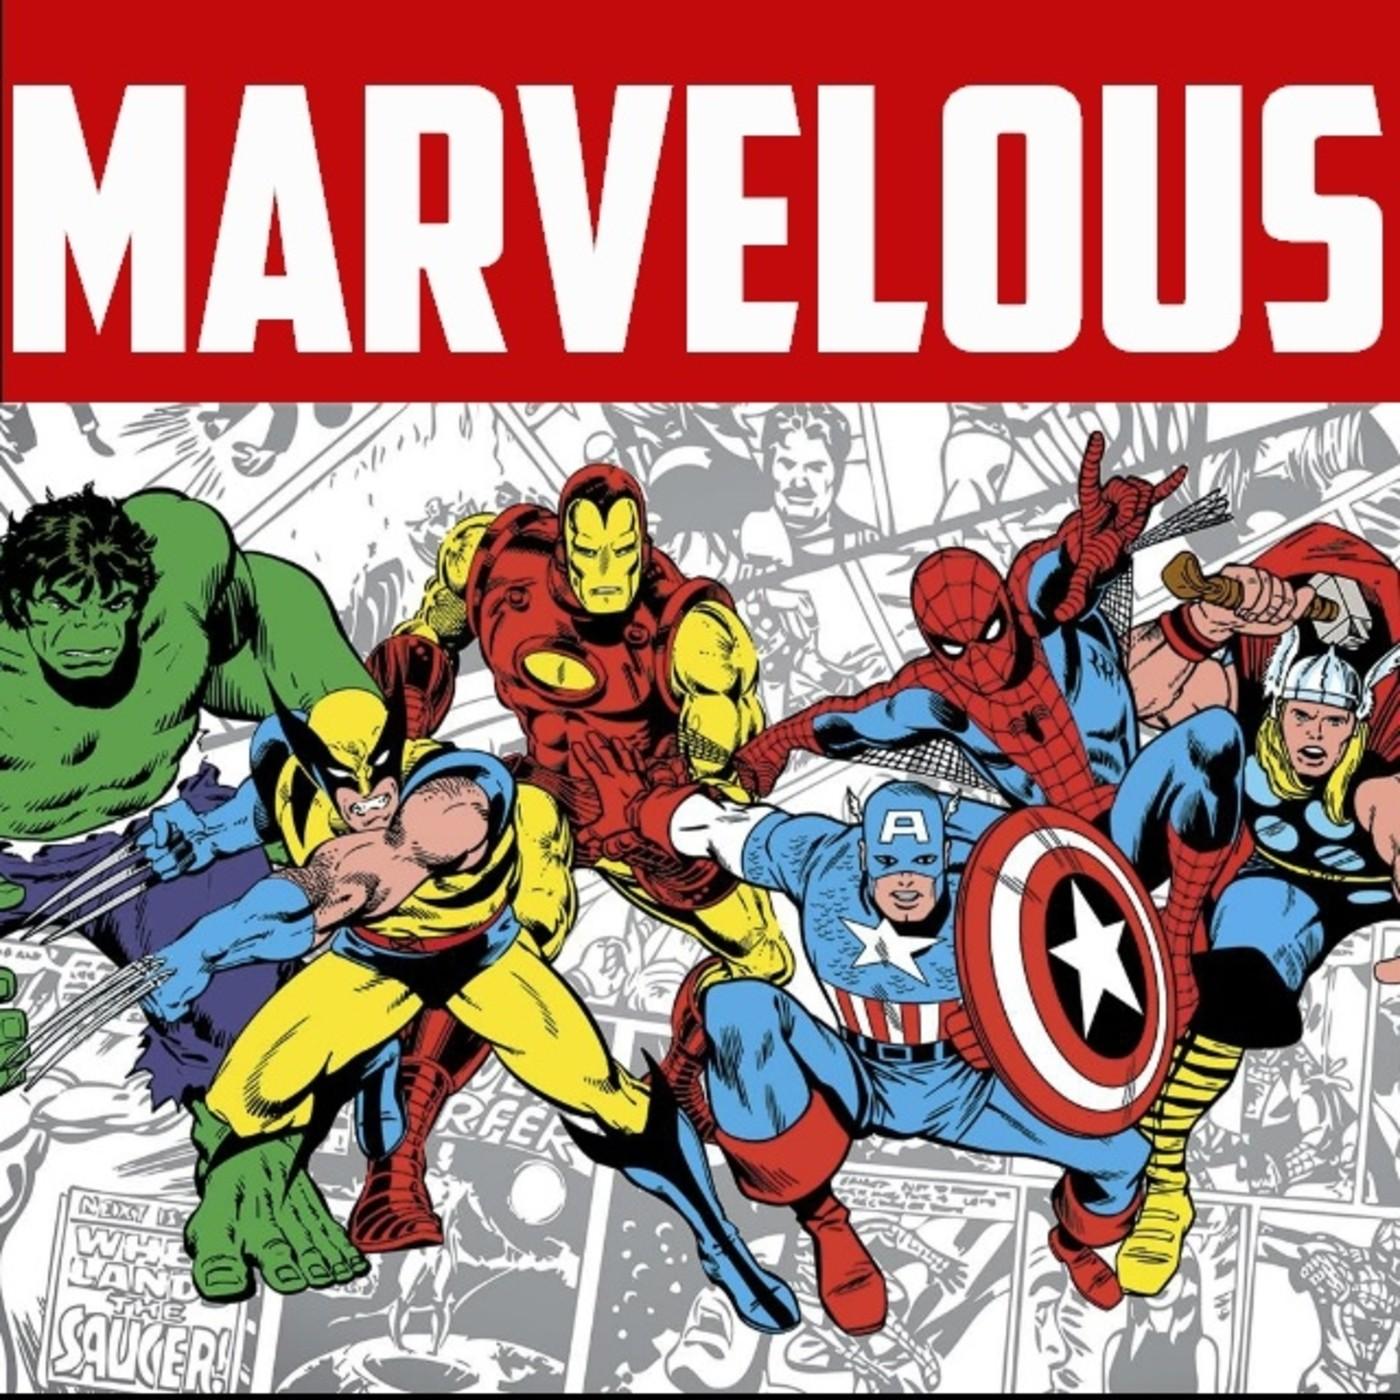 Marvelous -S01E01- El origen de Marvel, El proyecto ...